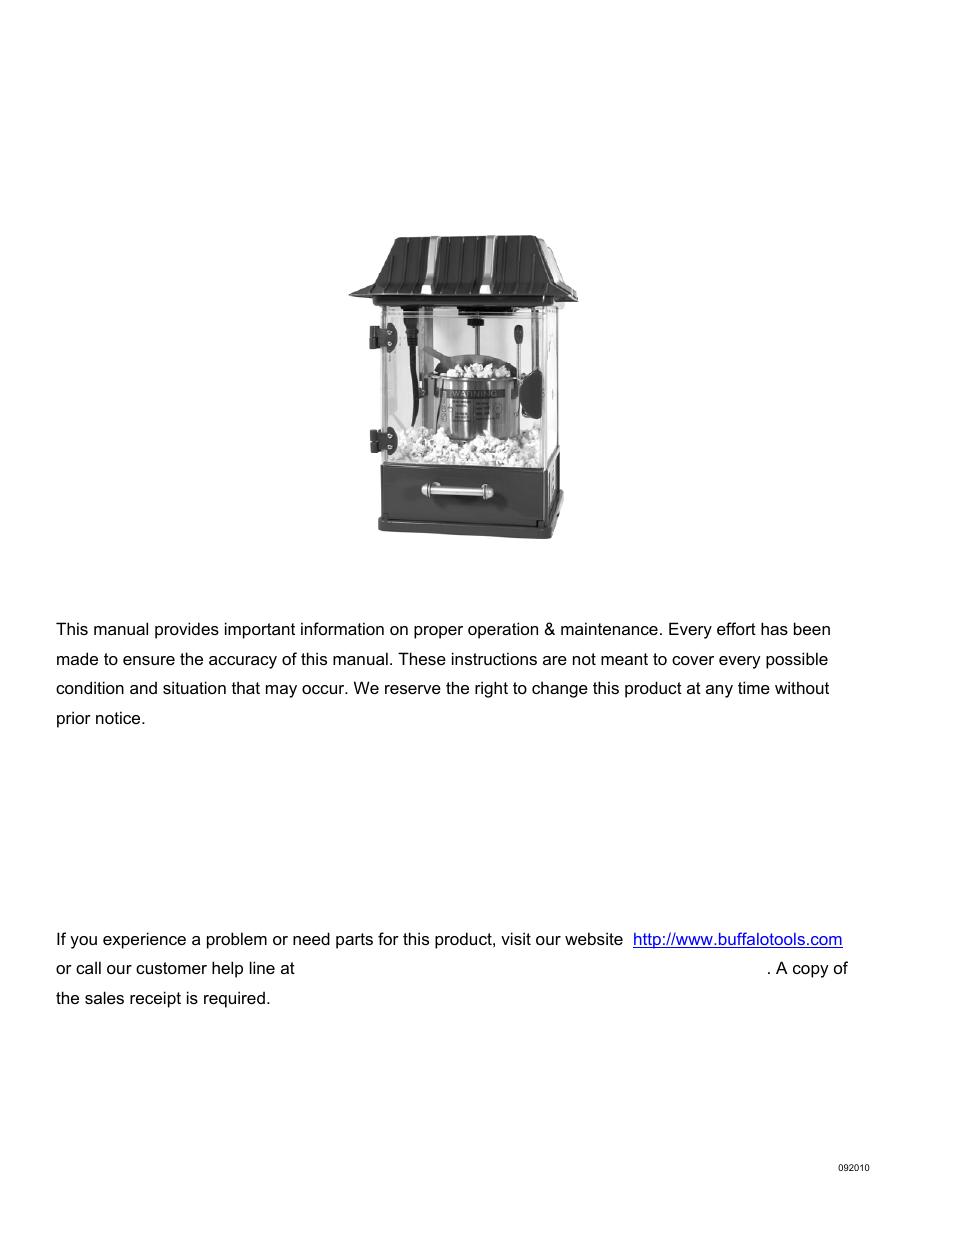 Amerihome Qtpop Table Top Popcorn Maker User Manual 6 Pages